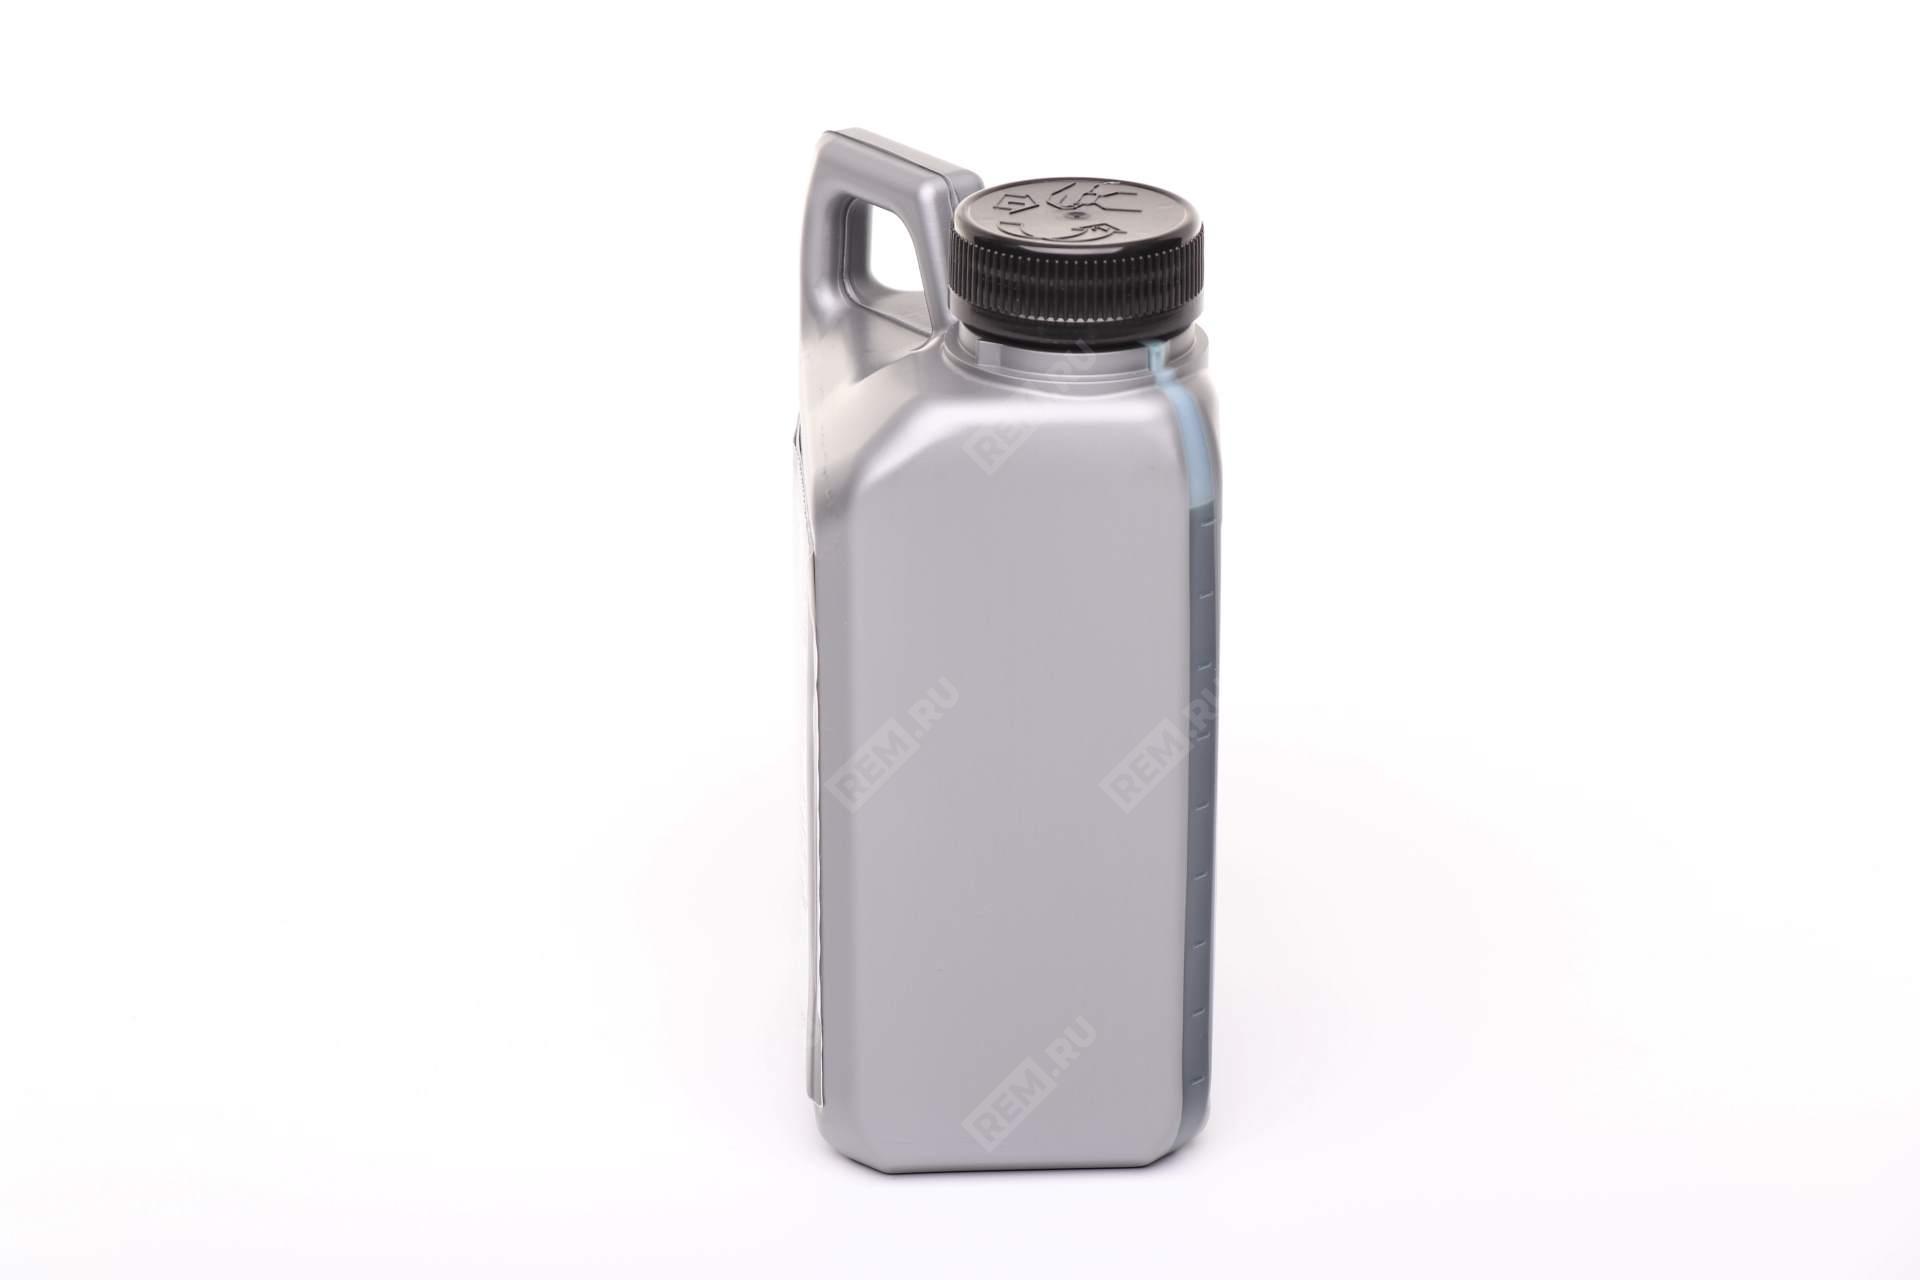 Жидкость ГУР 1Л 30741424